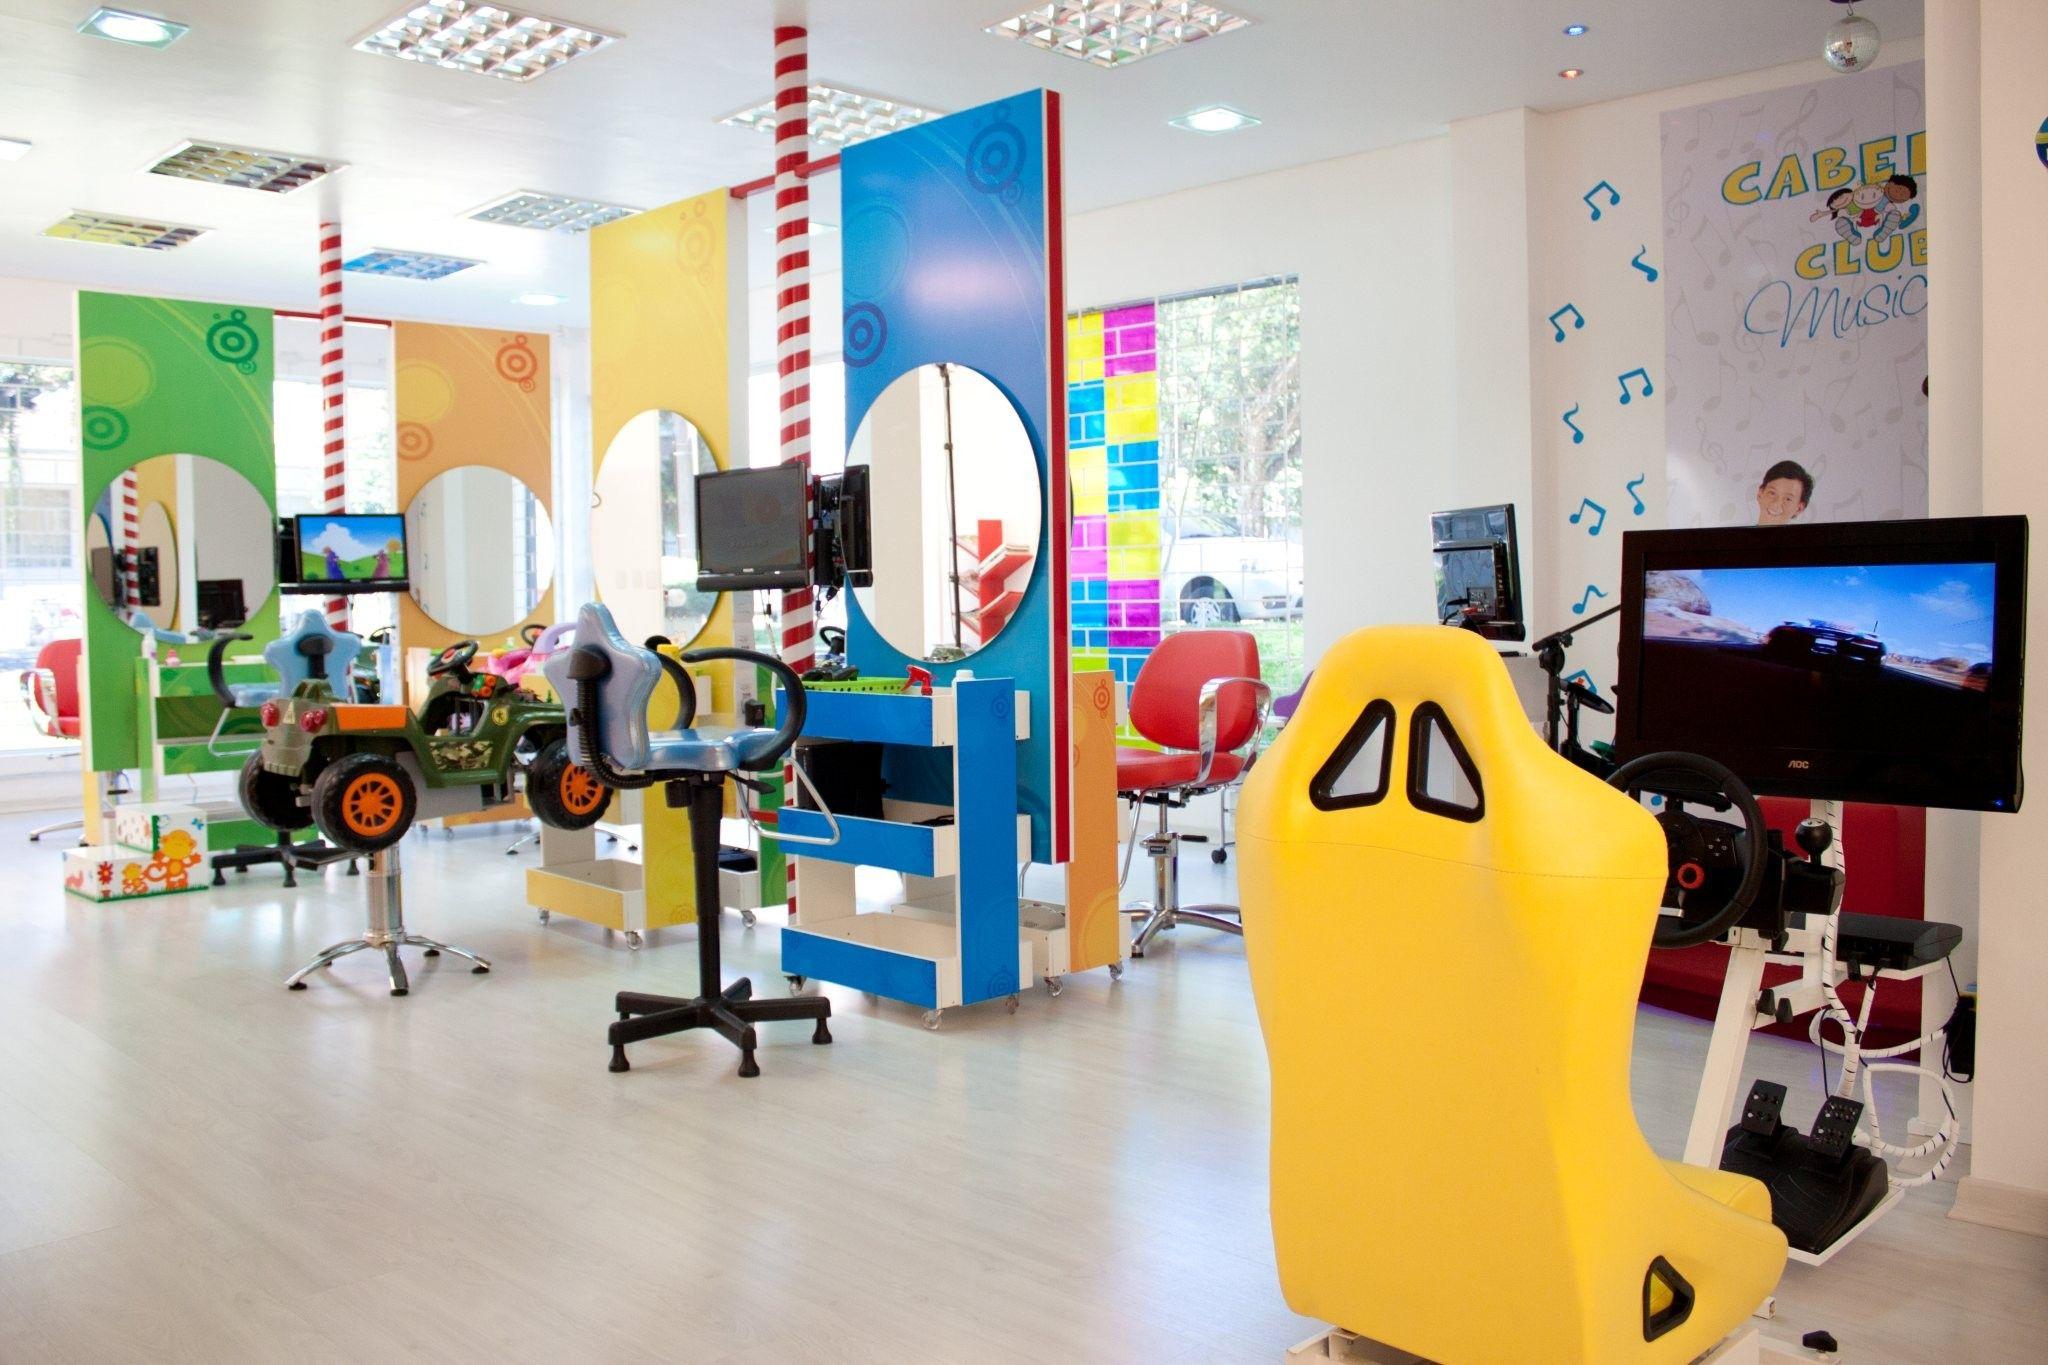 kid salon chairs. Salão De Beleza Infantil Em Brasília DF #cabeloclub #kids #hair #saloon Kid Salon Chairs